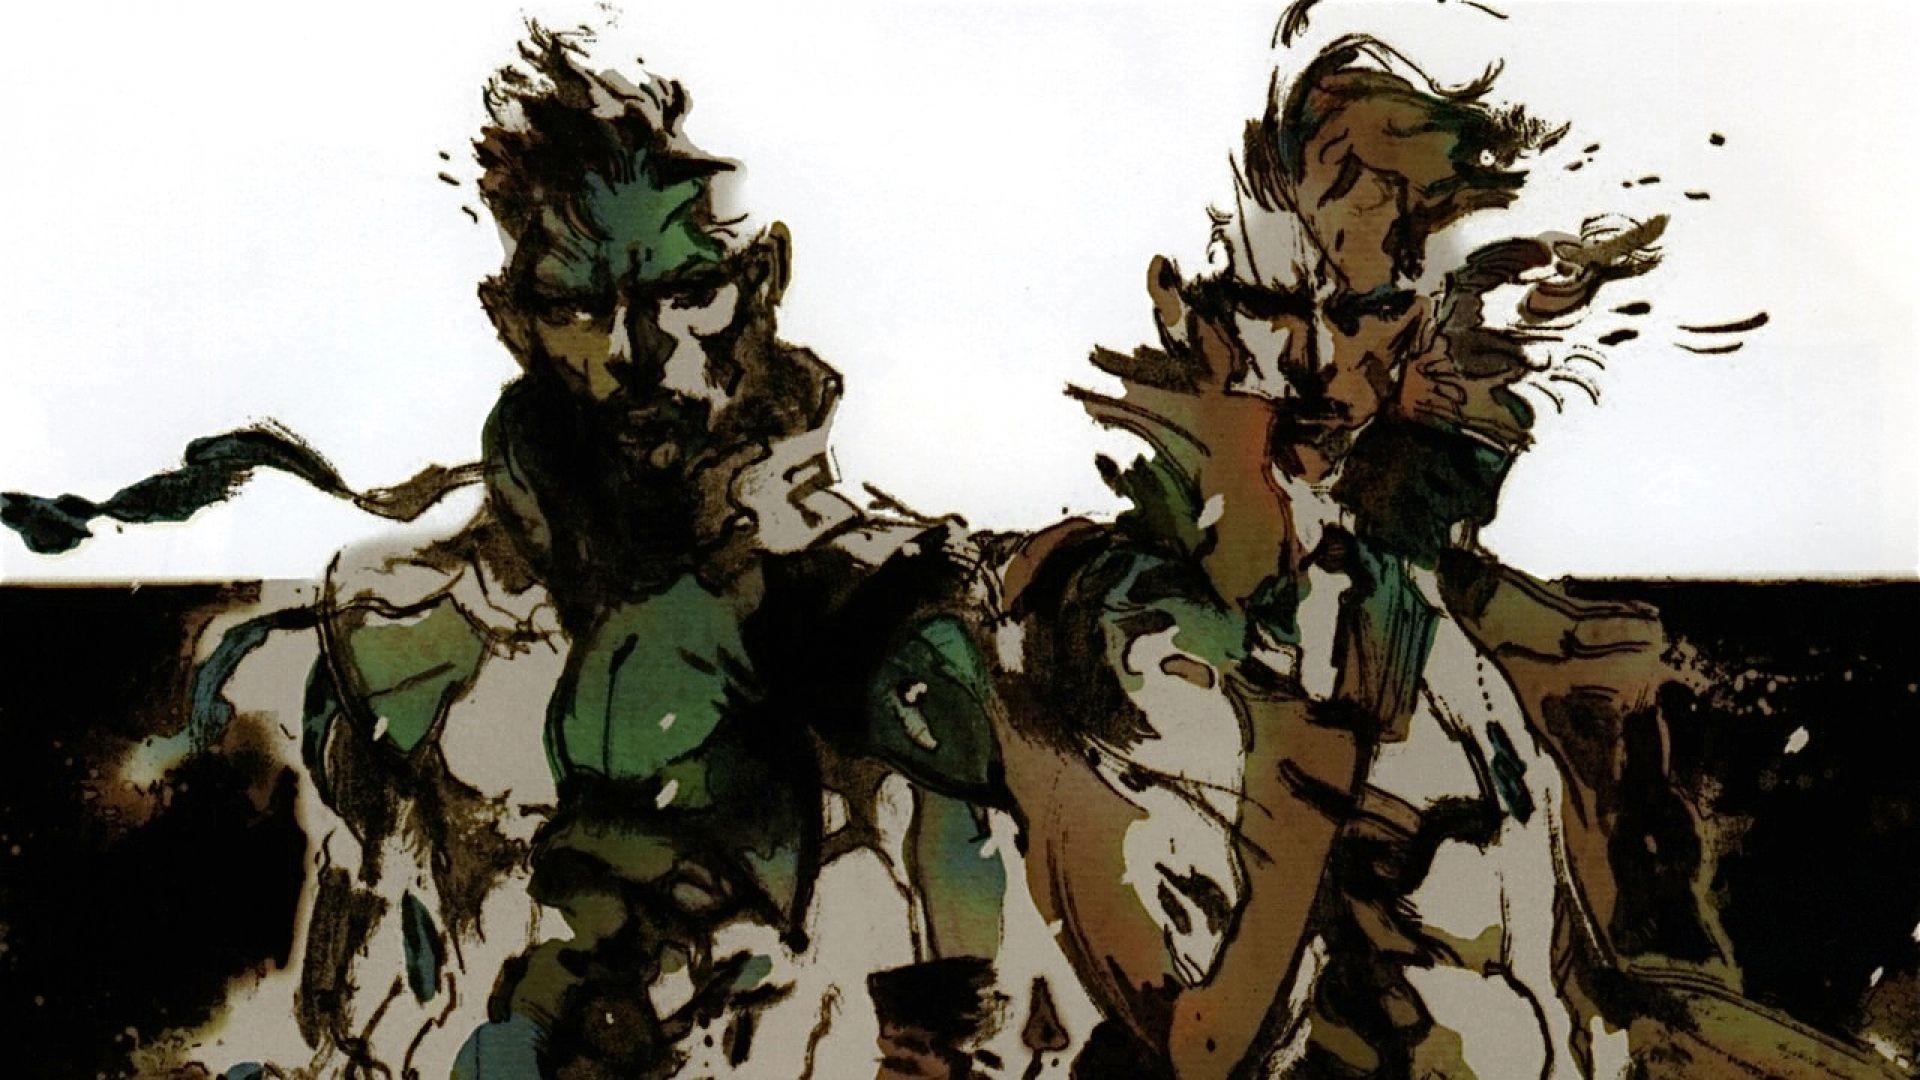 Metal Gear Solid HD Wallpaper